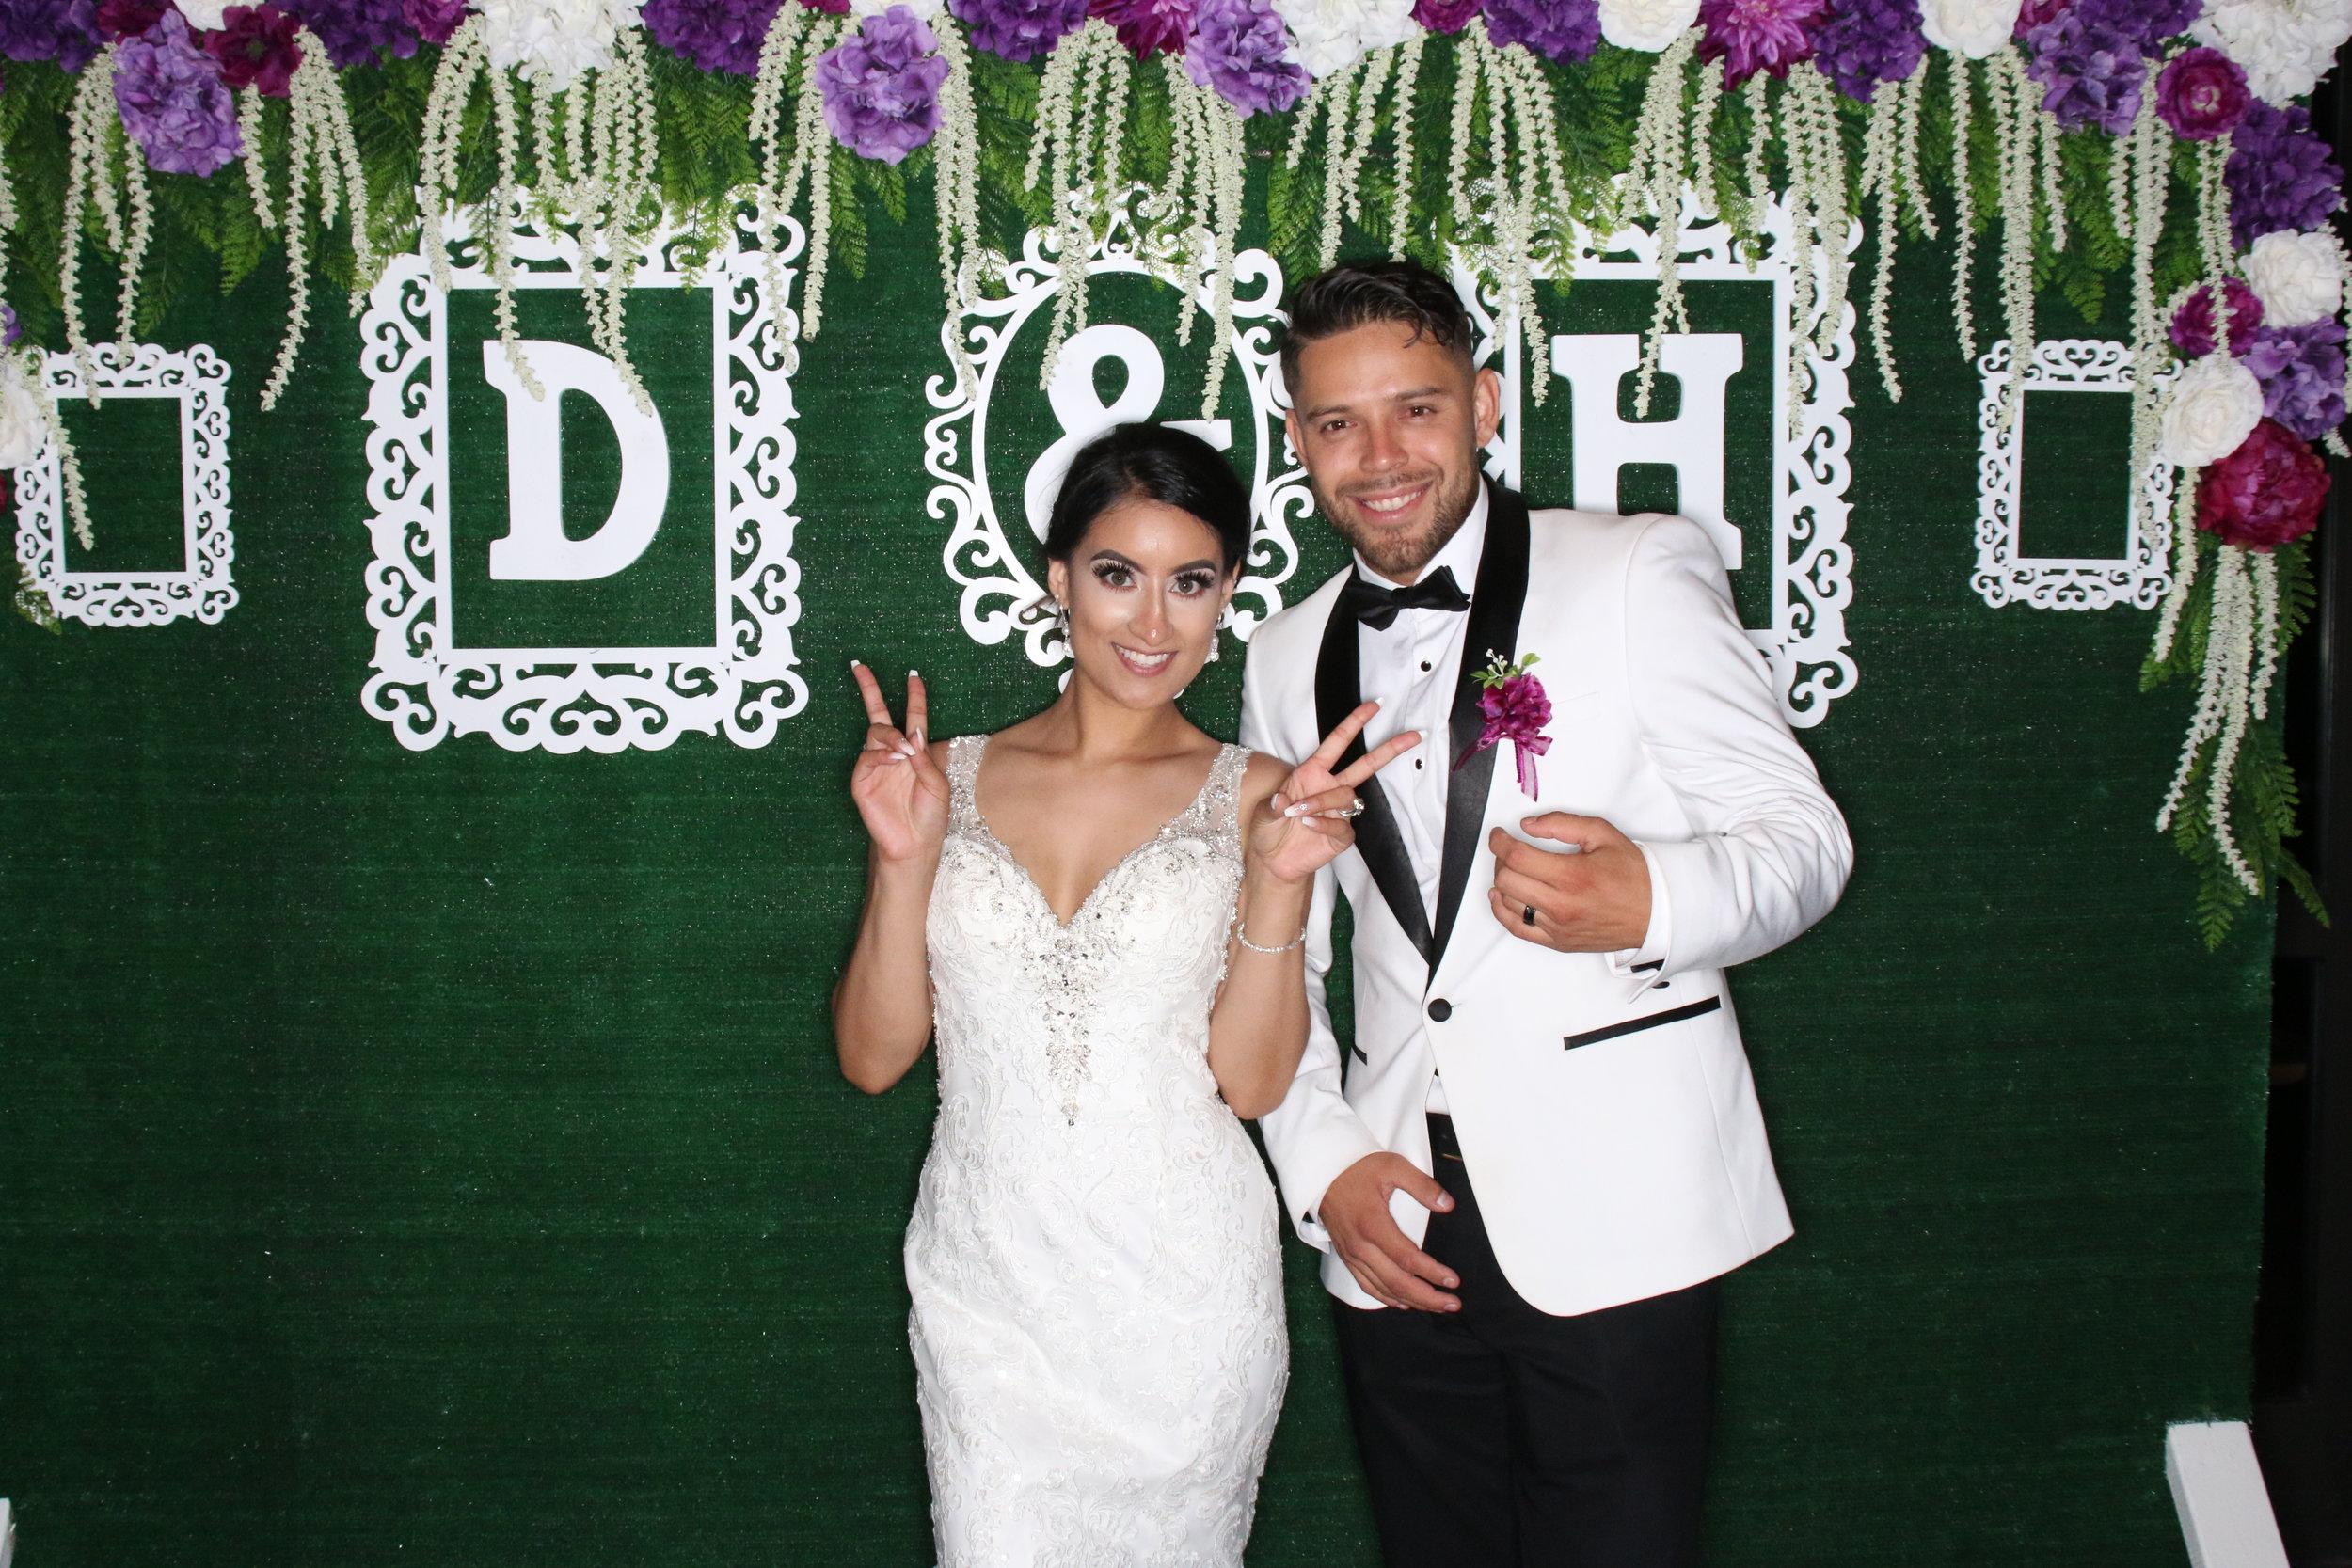 Diana and Hugo Wedding #1